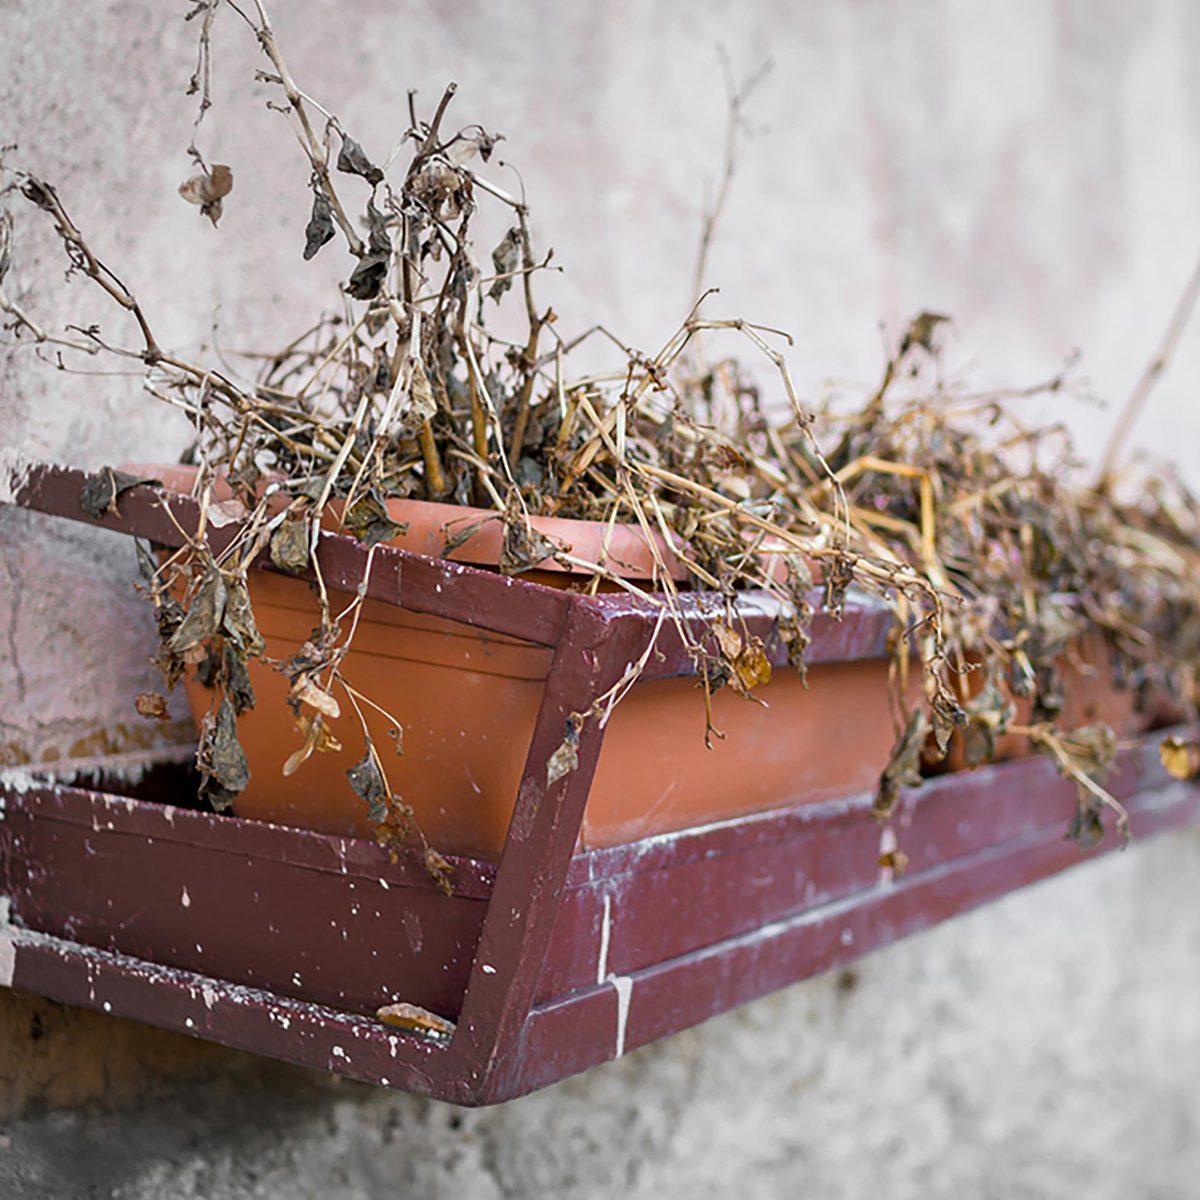 Dead plant on a window sill